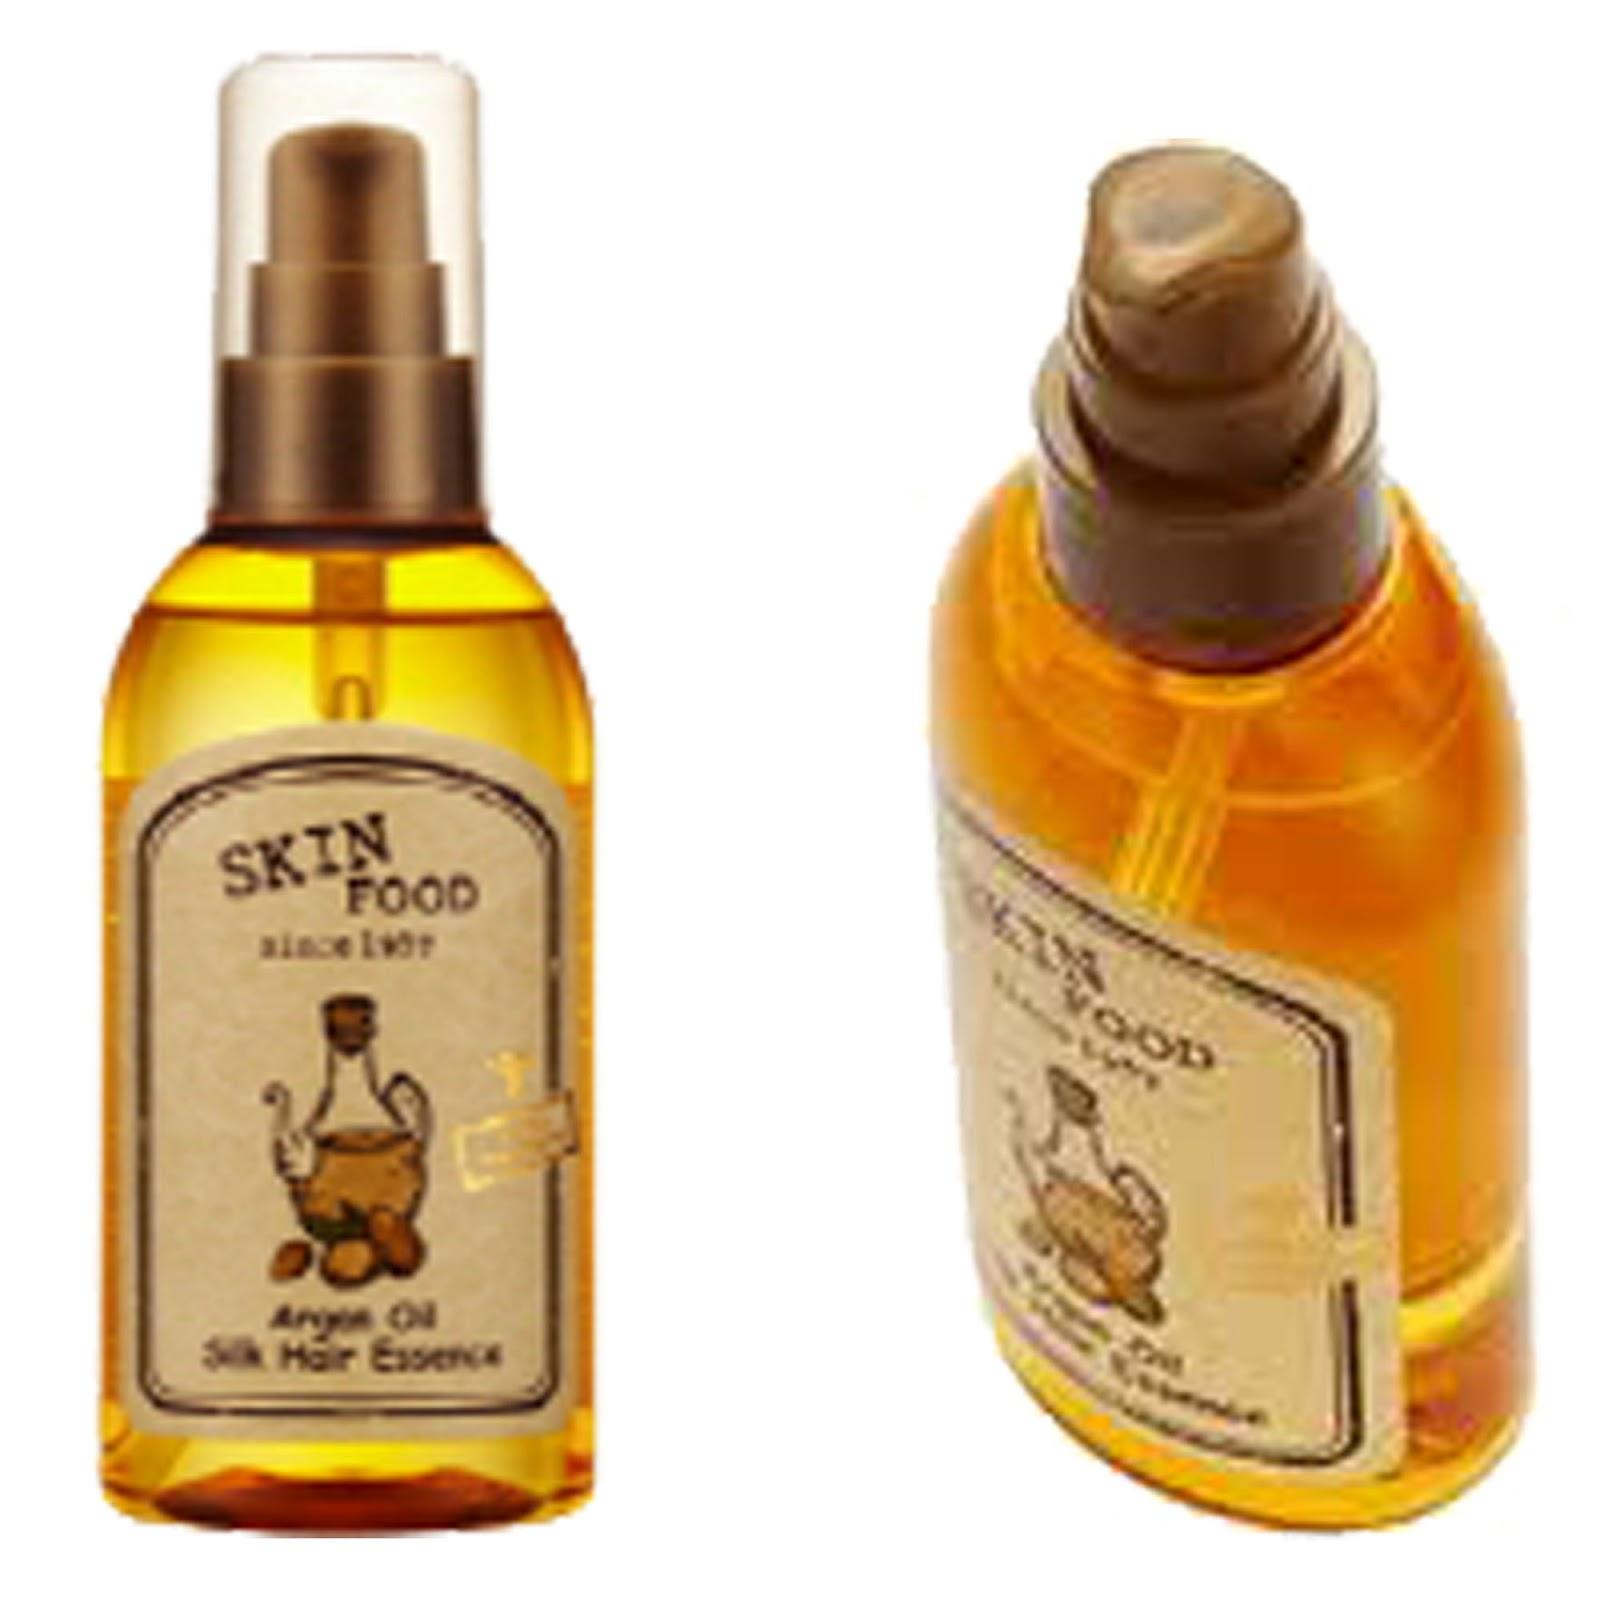 Shampoo Skin Food Review The Skin Food Argan